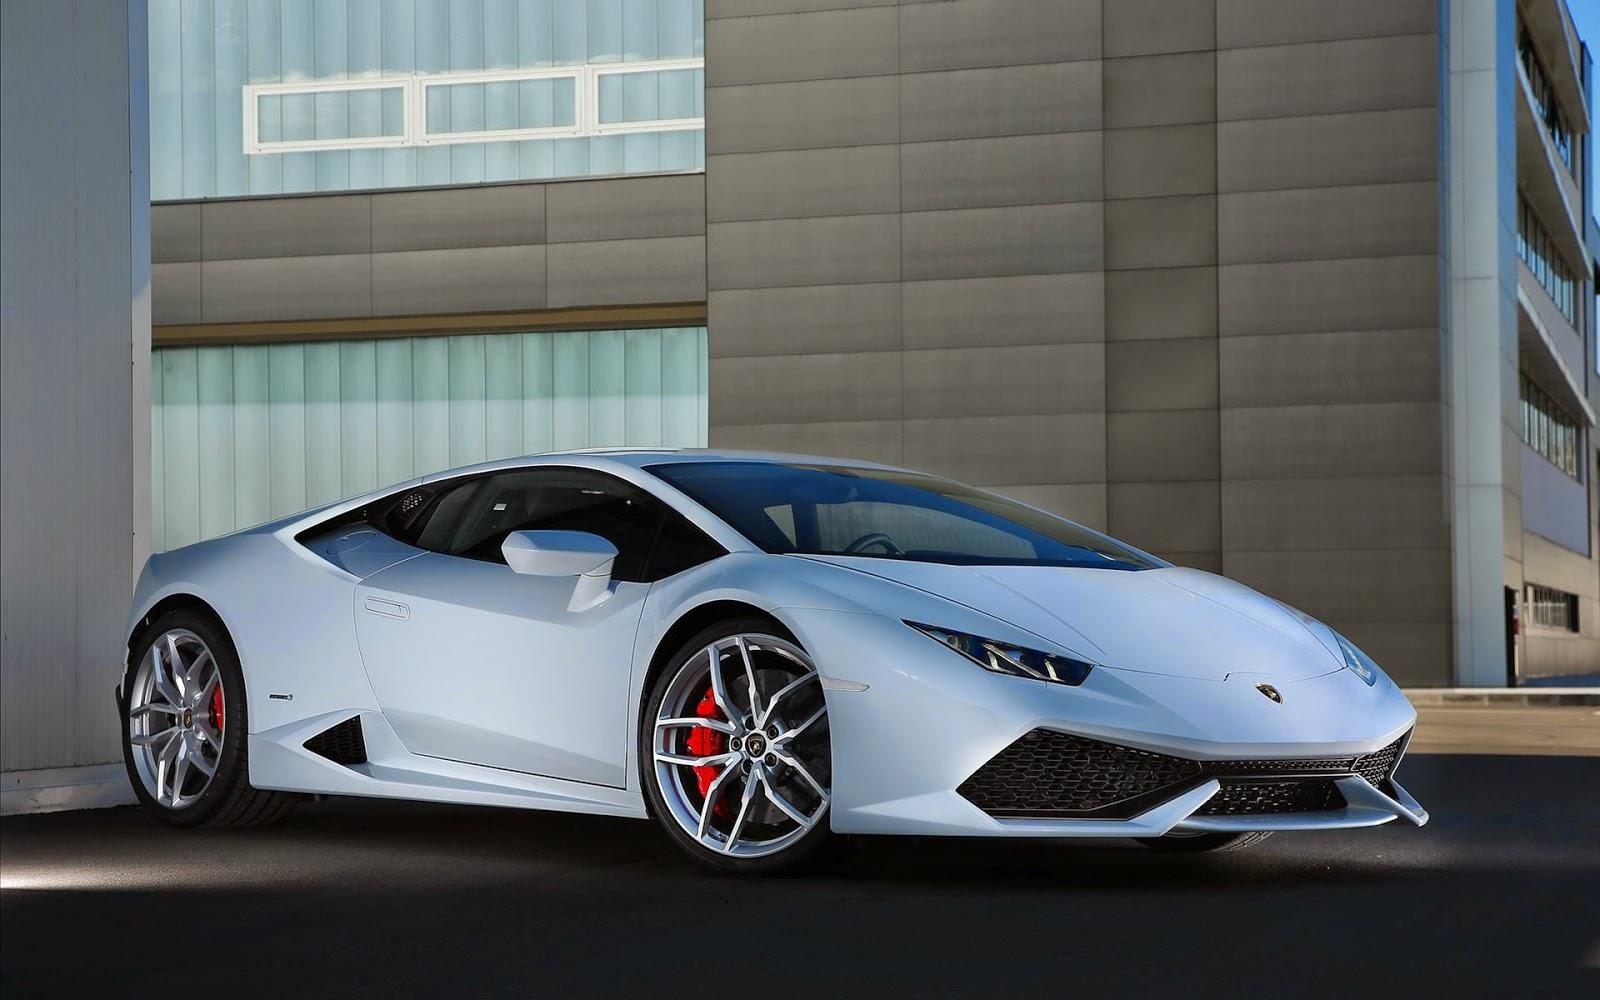 Lamborghini Huracan LP 610 4 2015 Video: Κόντρα Lamborghini Huracan με μαχητικό τζετ! Fun, Lamborghini, videos, vs